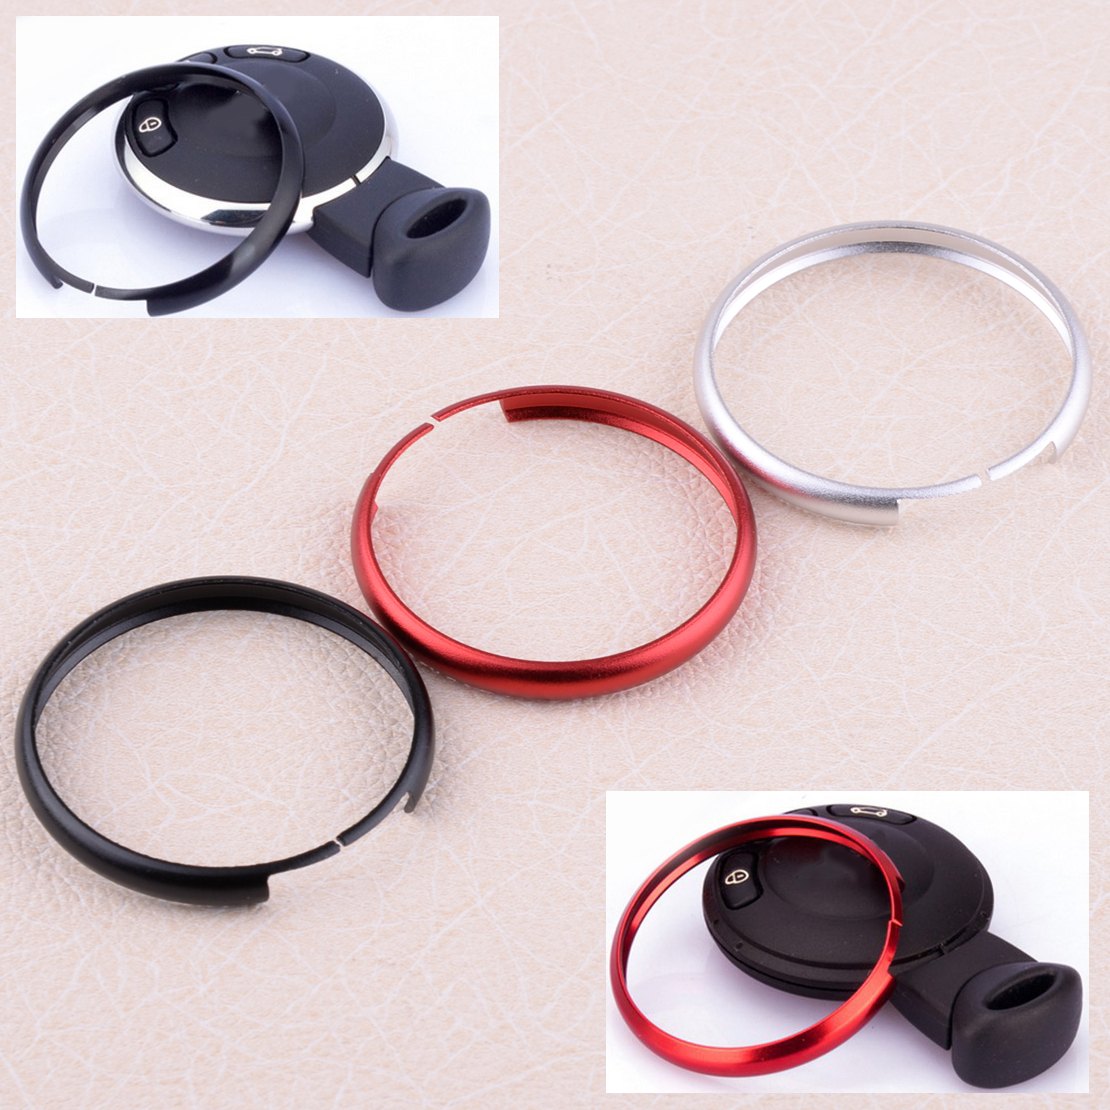 Black Metal Protective Ring Keyring For 08-Up Mini Cooper Smart Key Remote Case